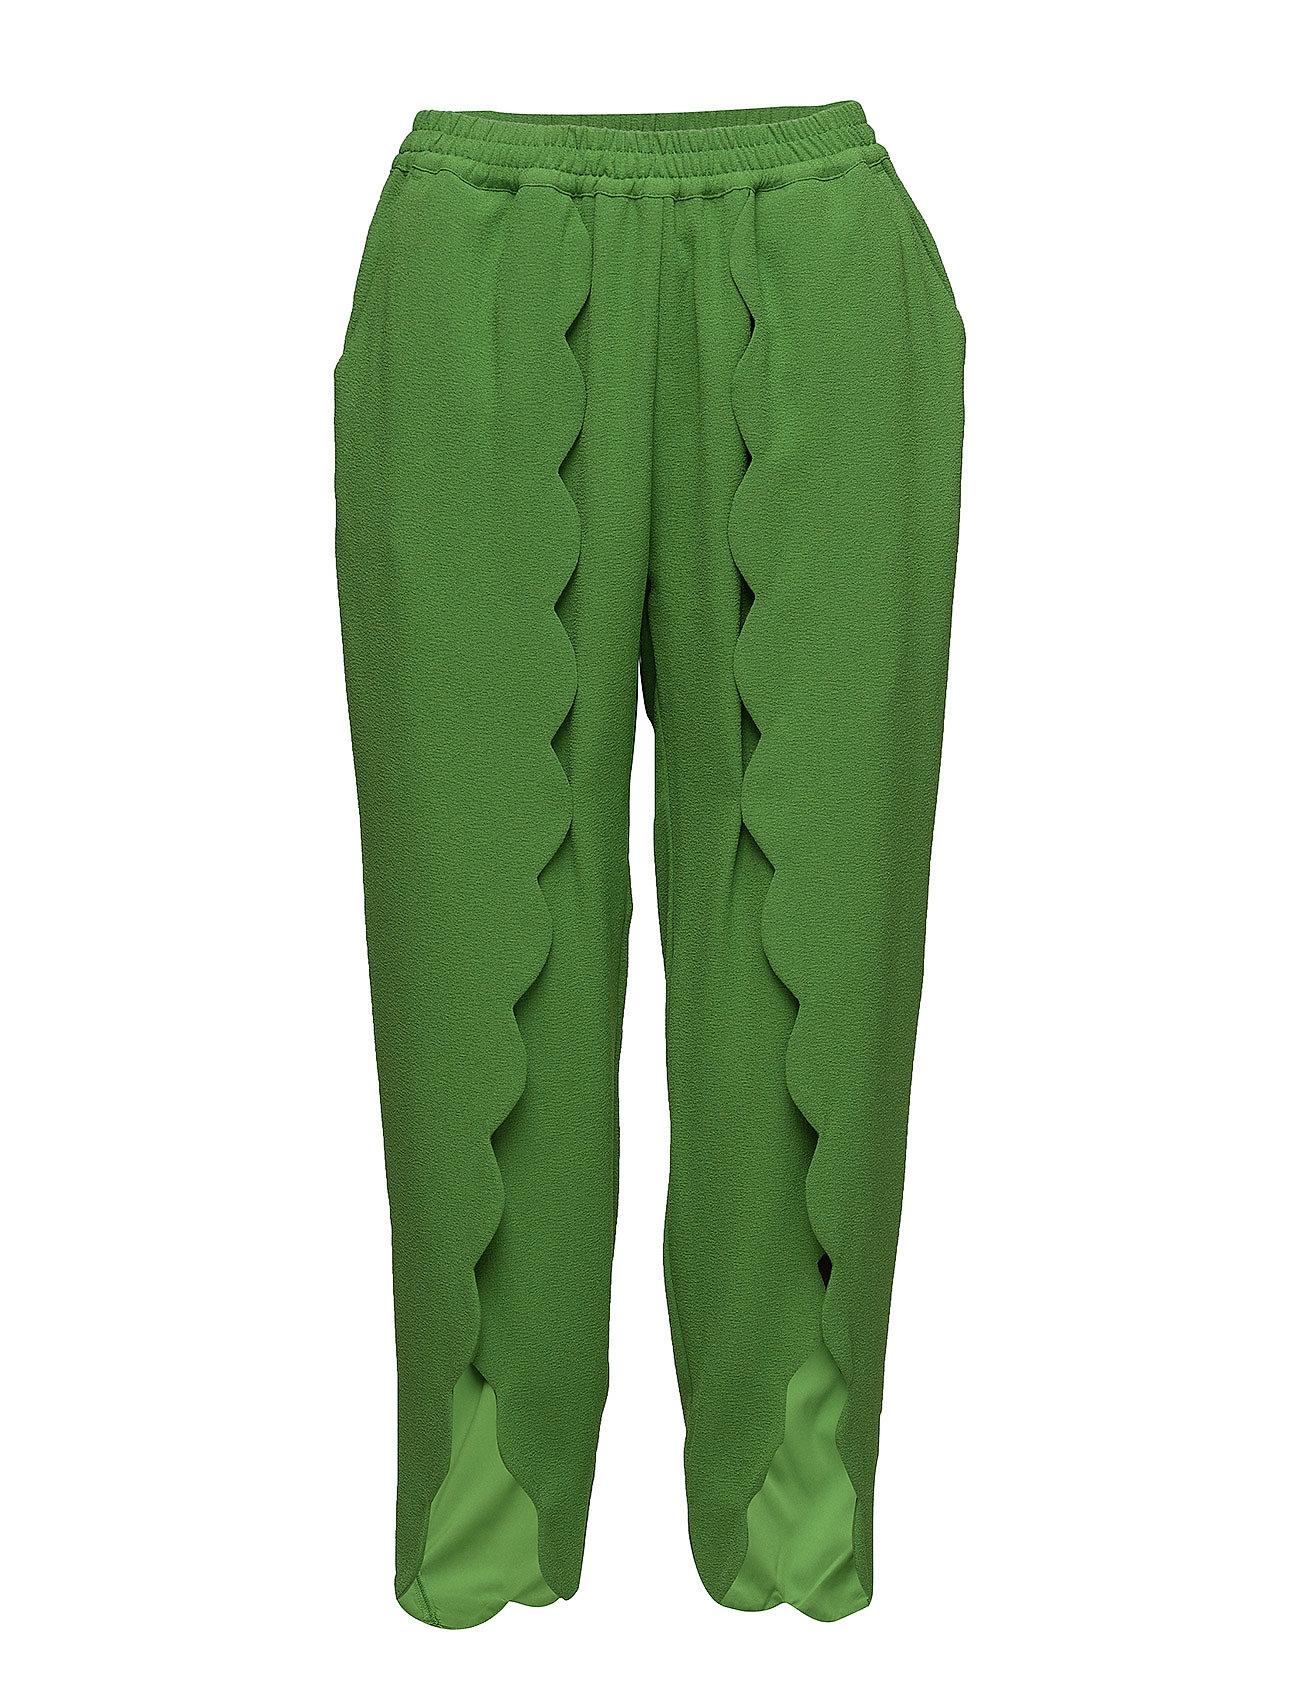 Image of Mattie Scallop Pants Slimfit Bukser Grøn DESIGNERS, REMIX (2978588261)